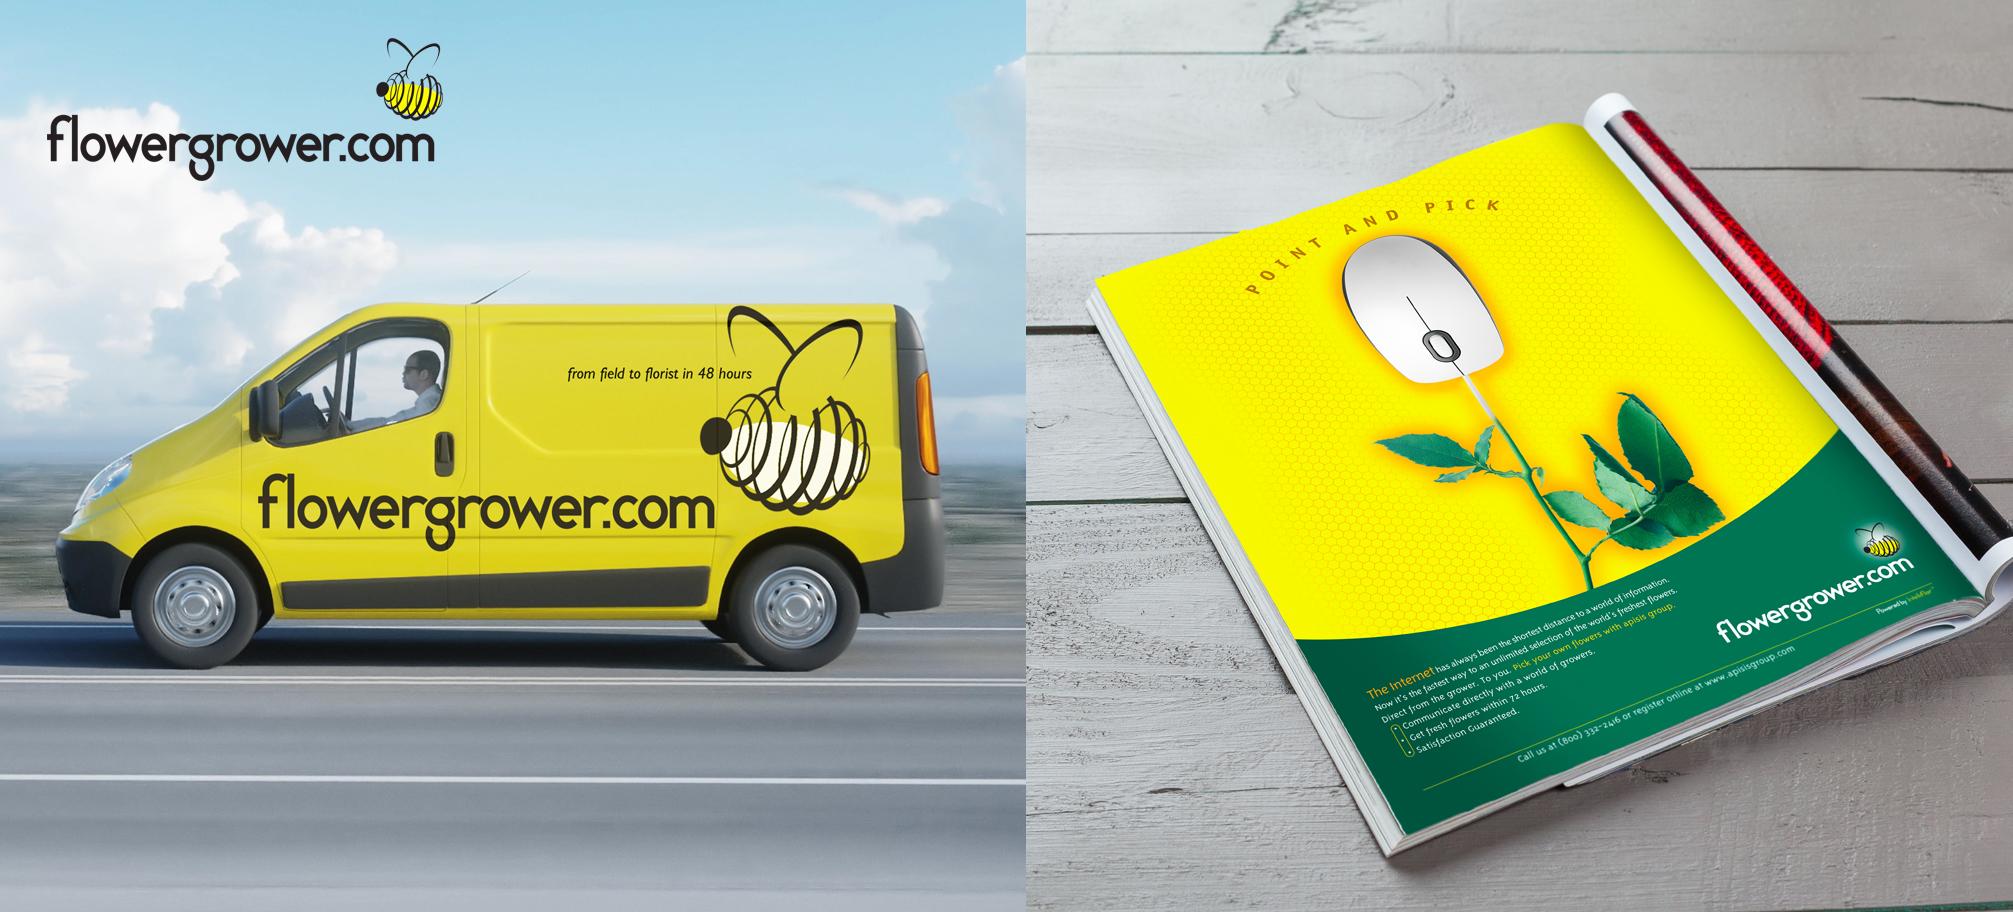 Flowergrower.com Brand Launch